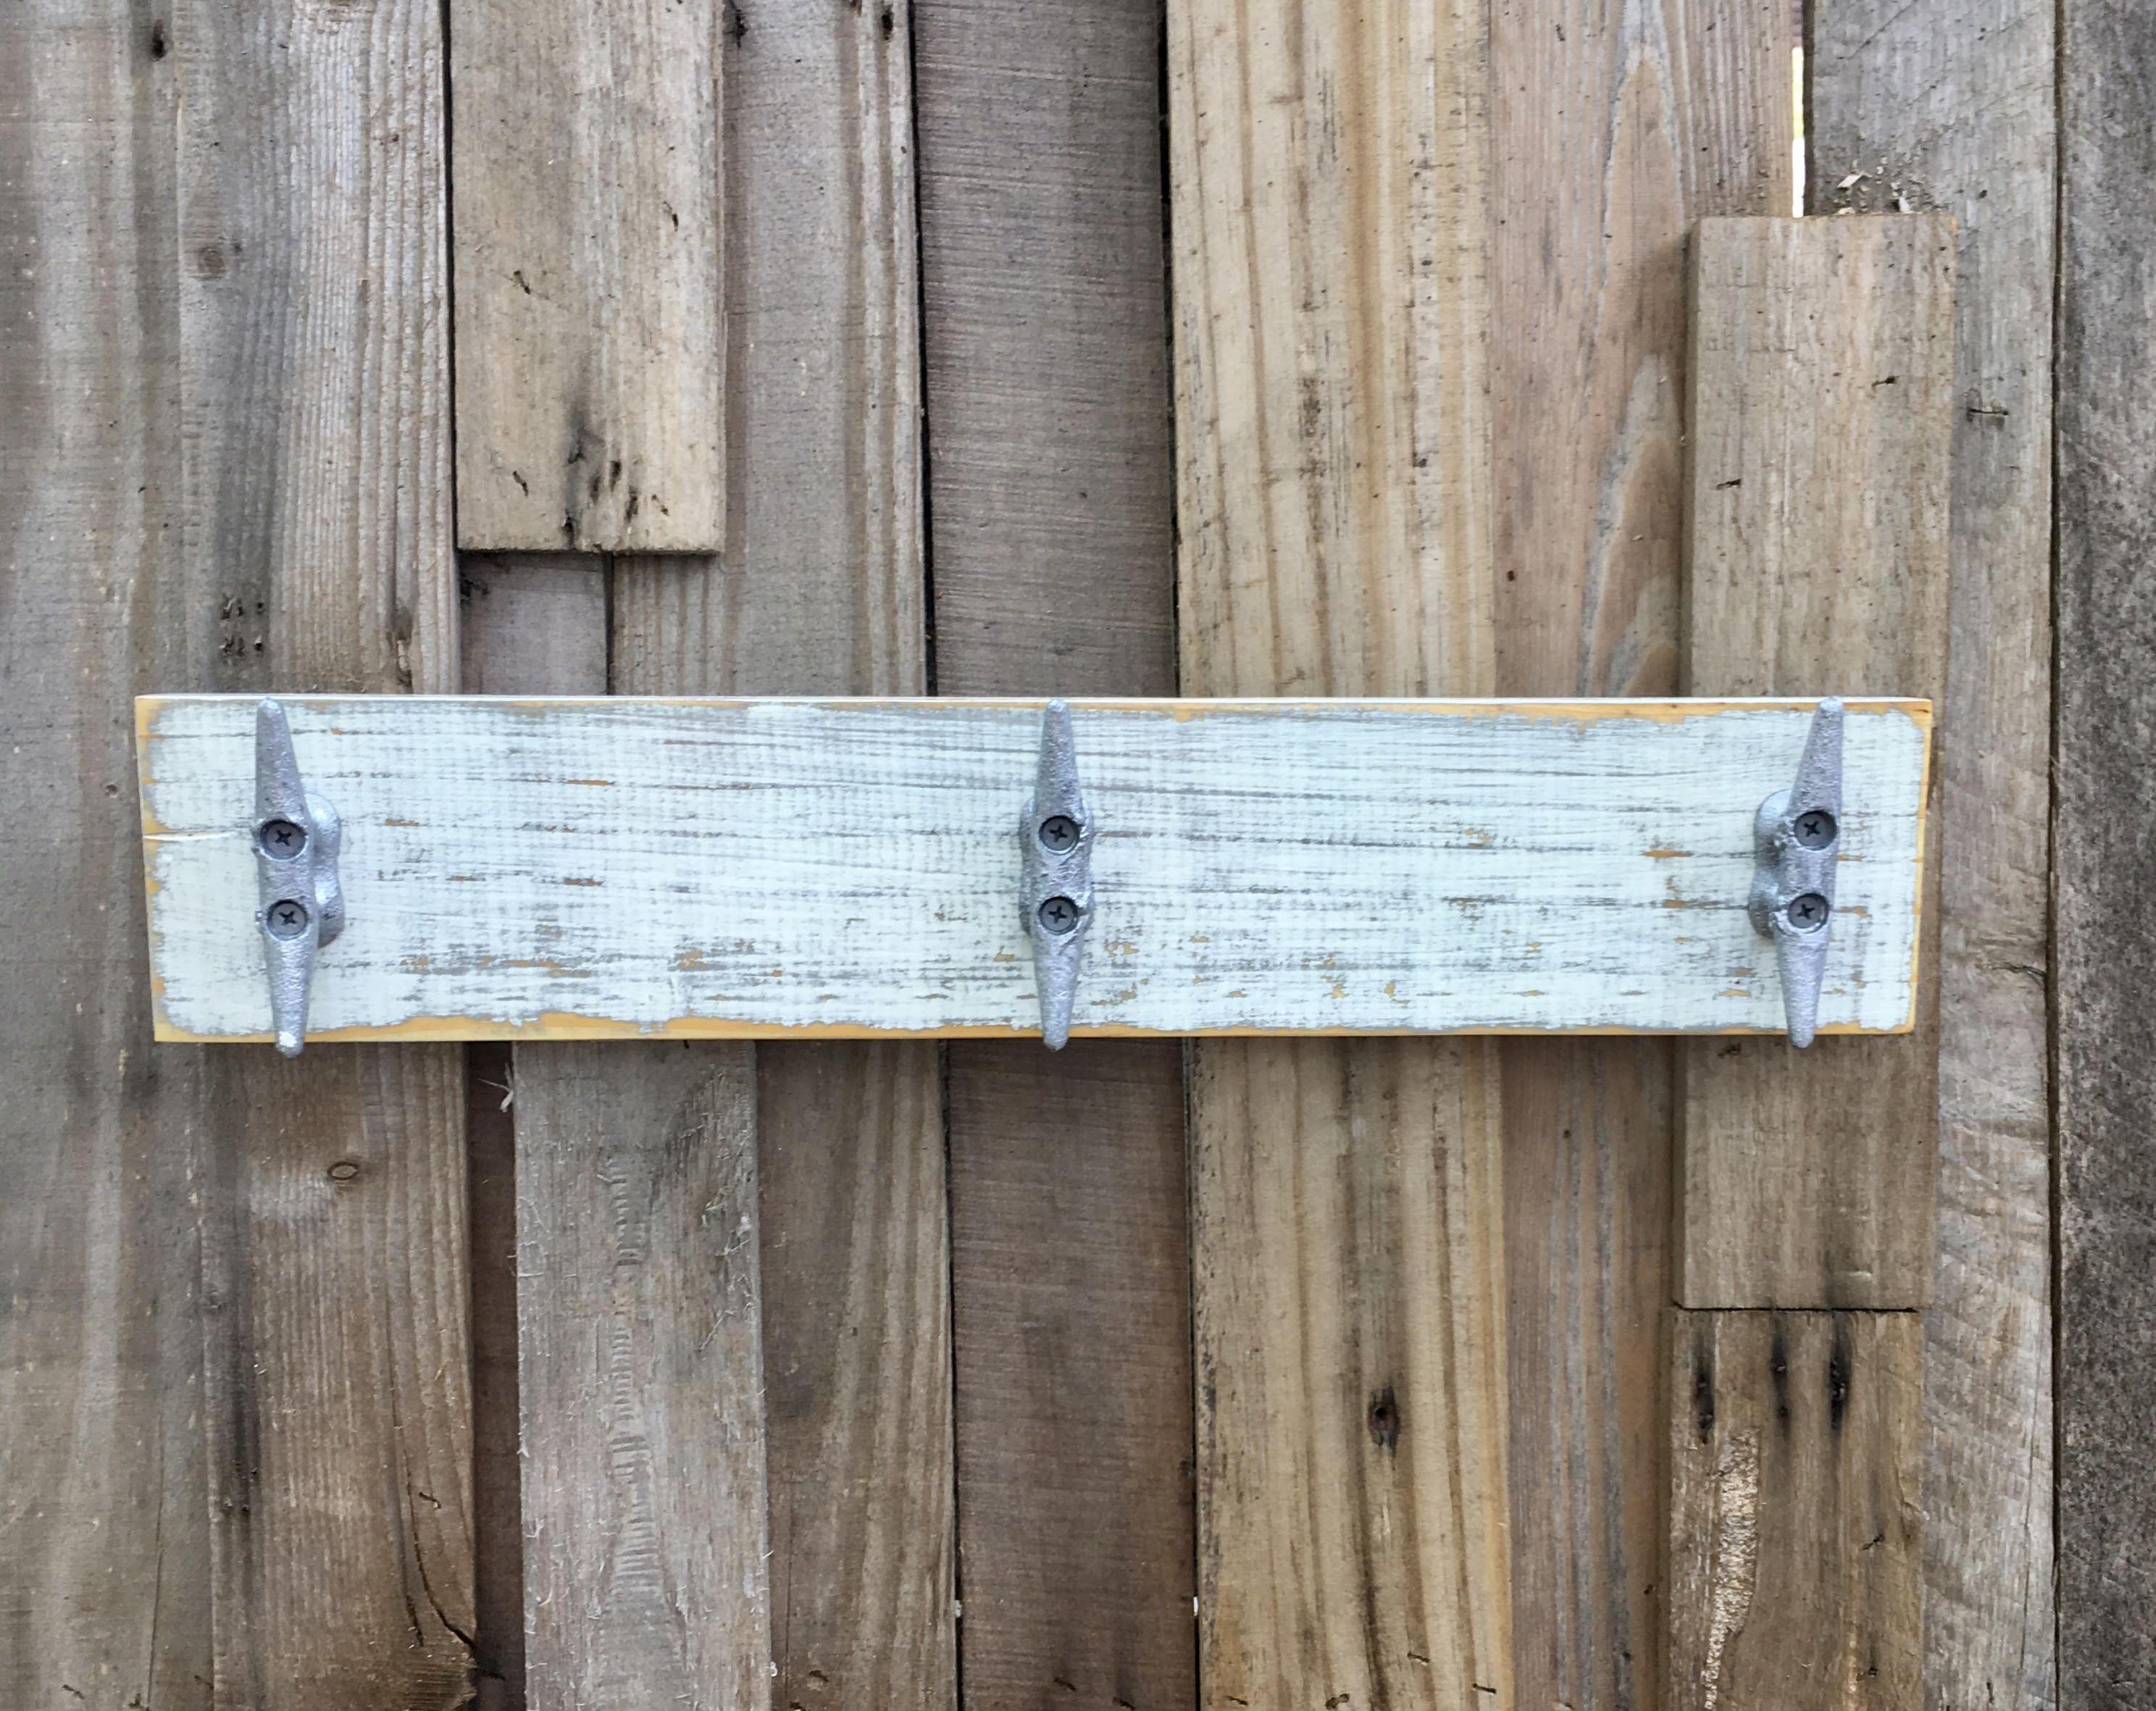 Boat Cleat Coat Rack Nautical Towel Rack Book Bag Rack Hat Rack Key Rack Distressed White Over Gray With Images Boat Cleats Towel Rack Bag Rack